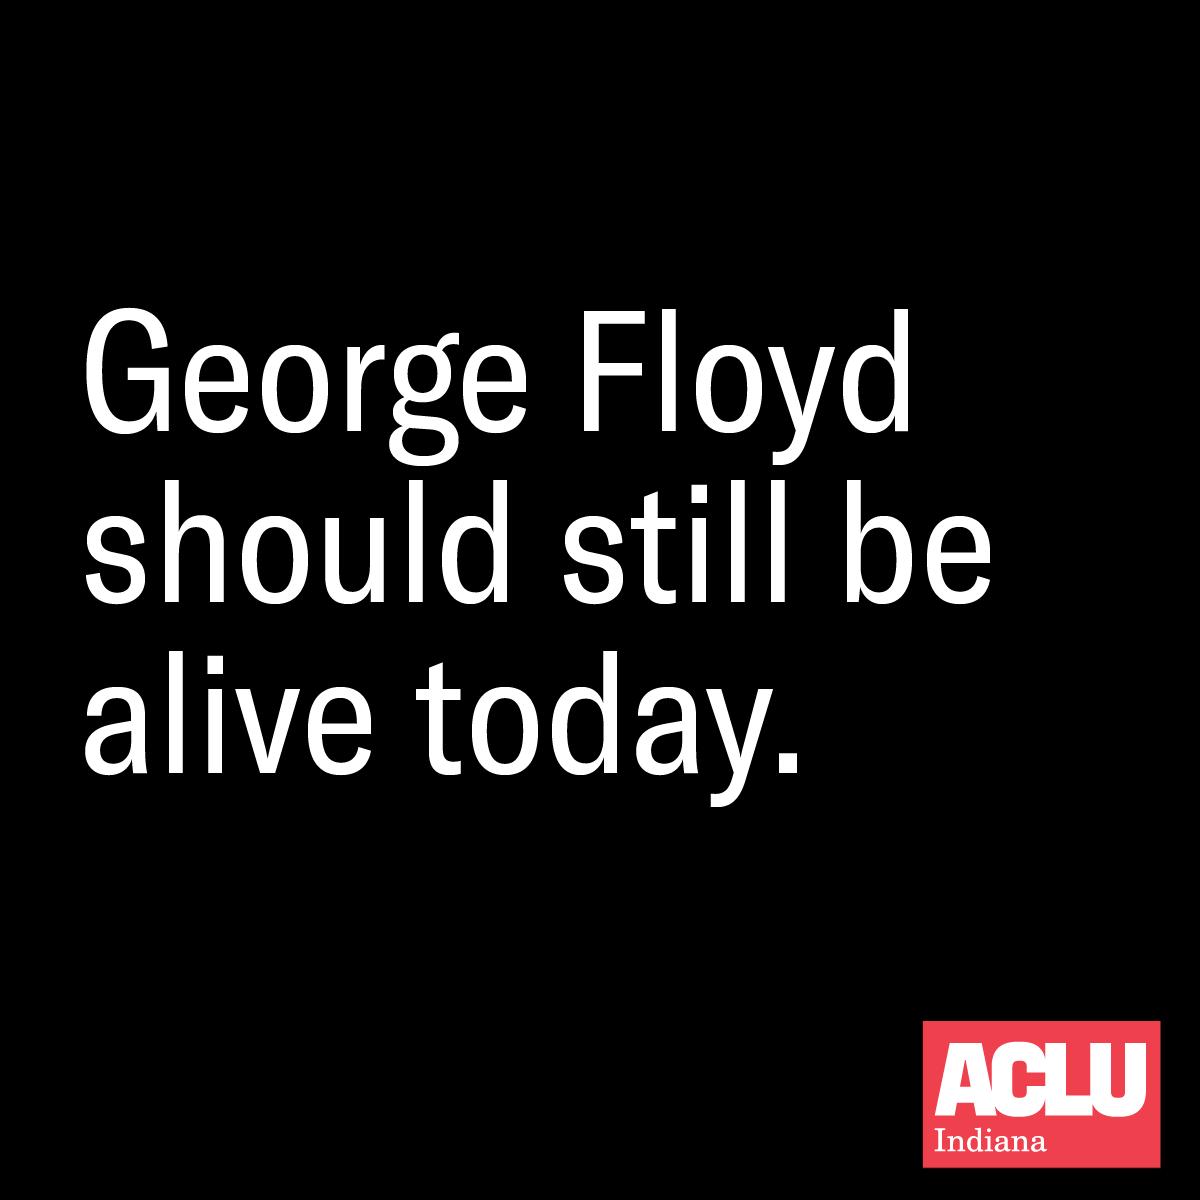 Black. Lives. Matter. https://t.co/Wm9mU9hfO4